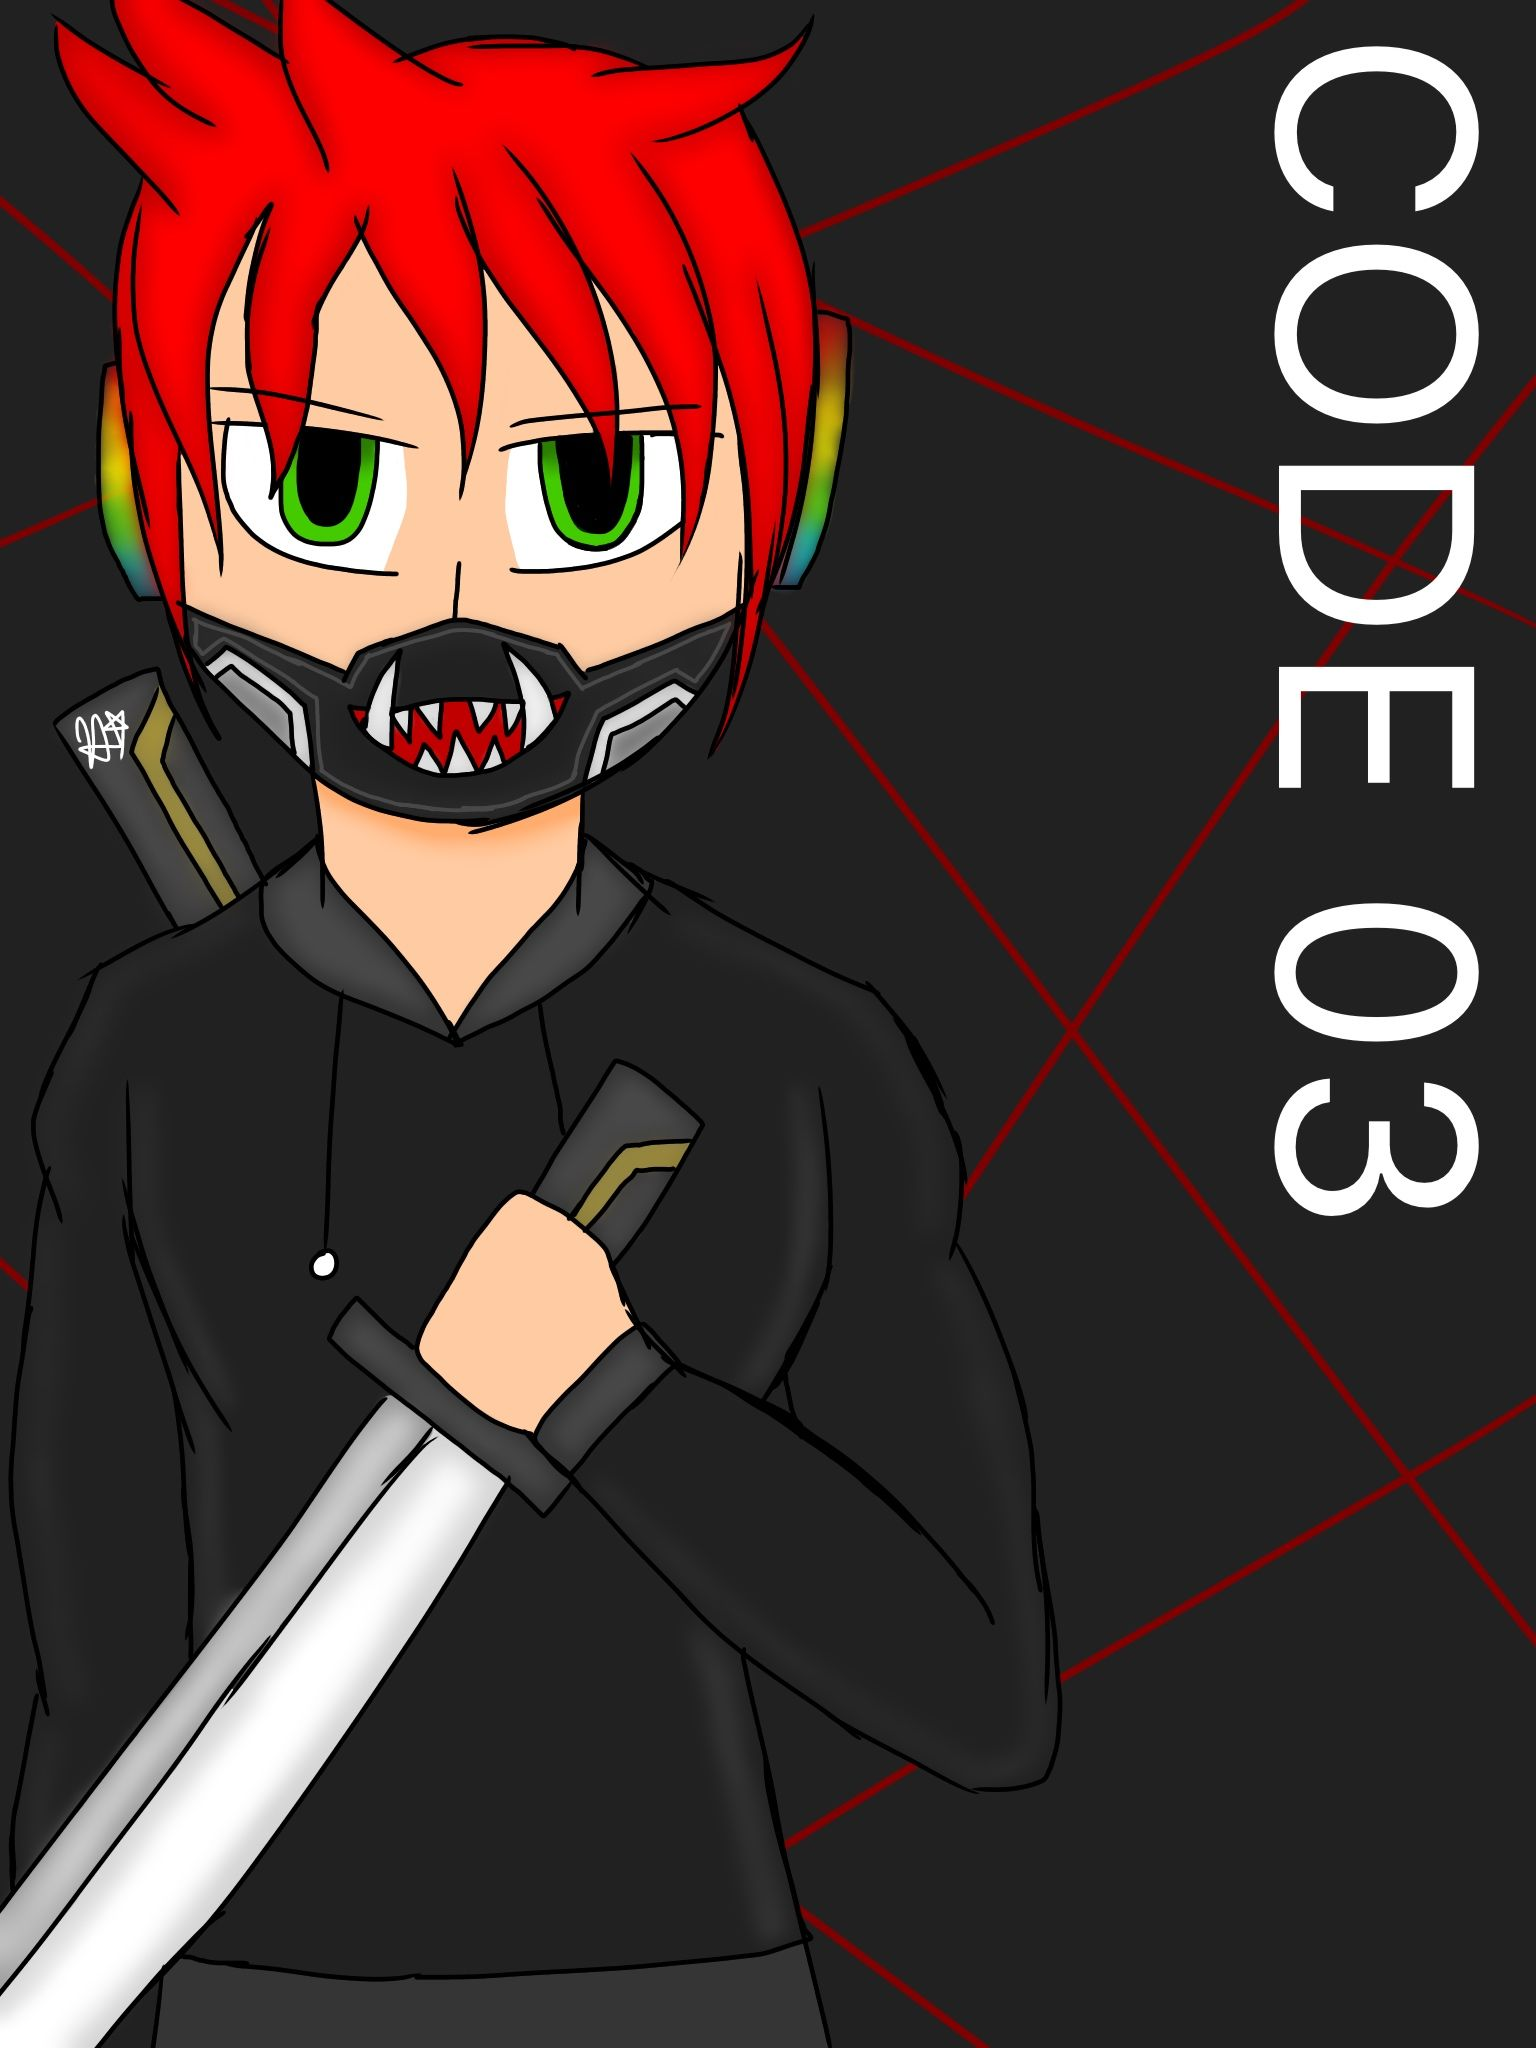 Silent Dark Roblox - Roblox Art Code 03